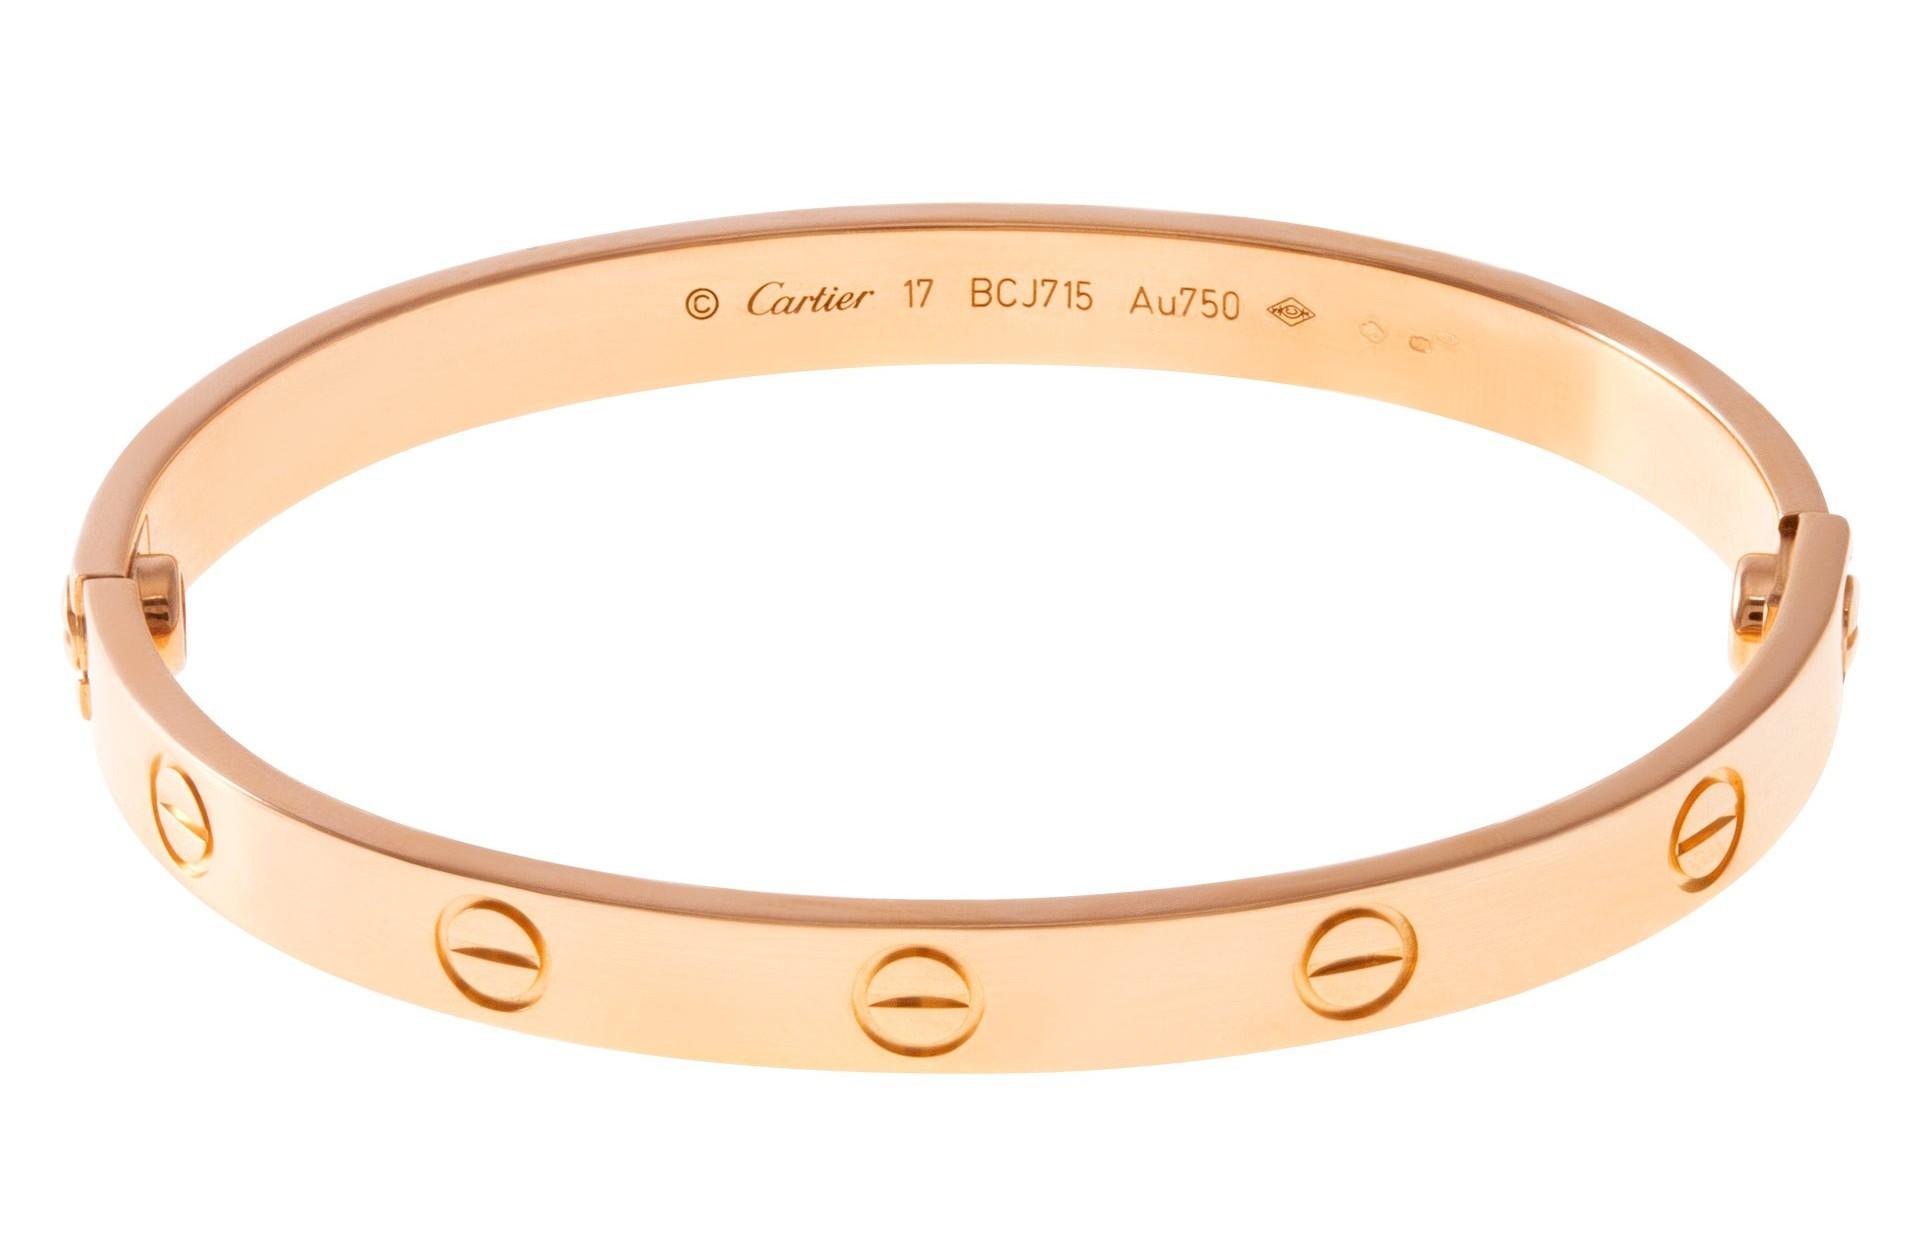 Valentine's Day Designer Jewelry Gifts: Cartier Love Bracelet